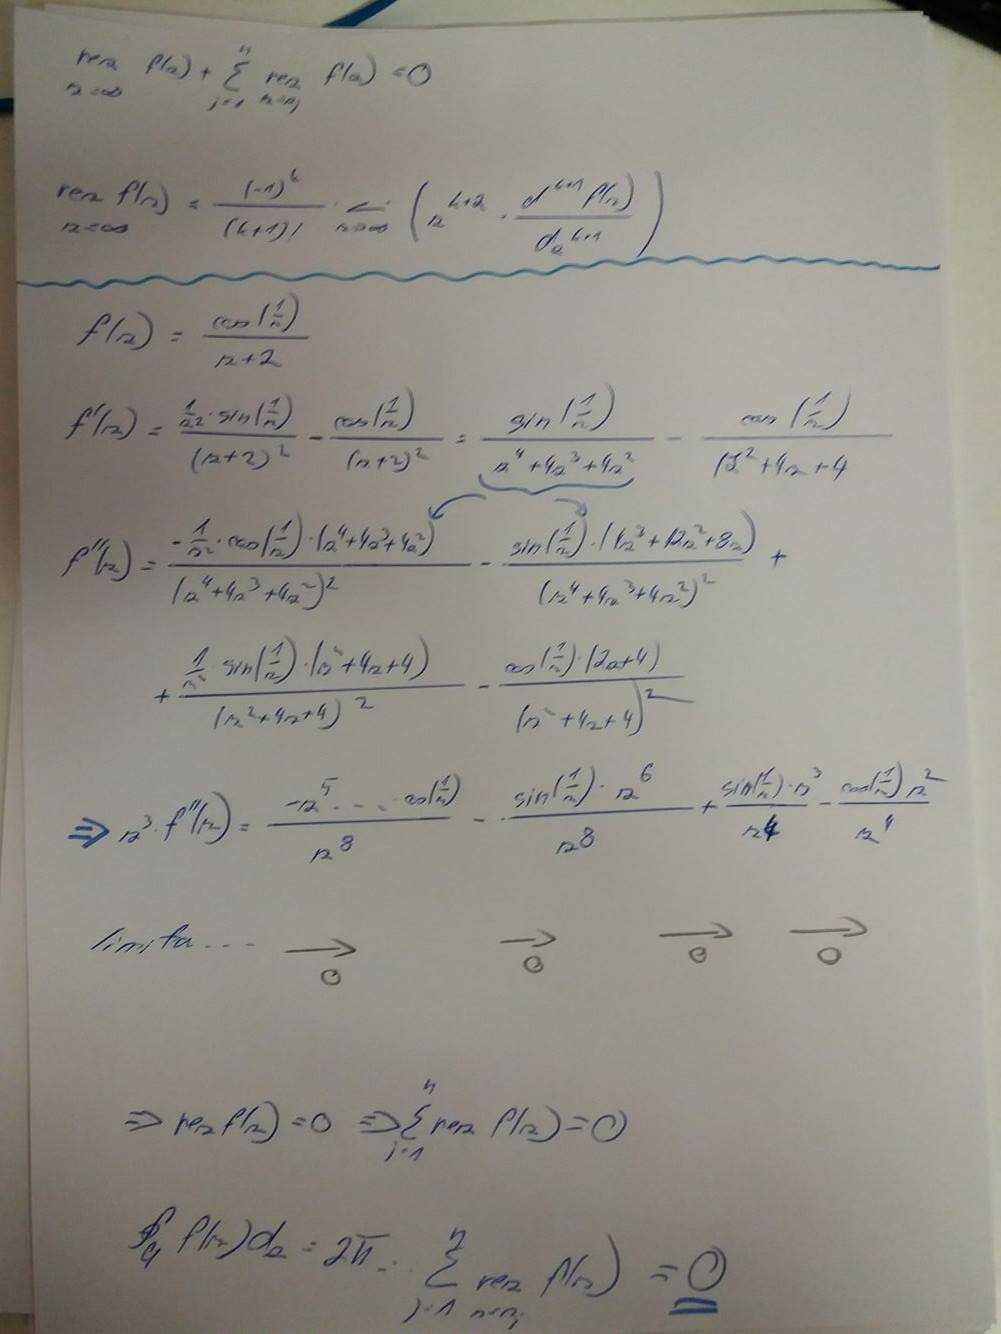 http://forum.matematika.cz/upload3/img/2017-06/73745_19182009_1574988562513651_50686395_o%2B%25281%2529.jpg